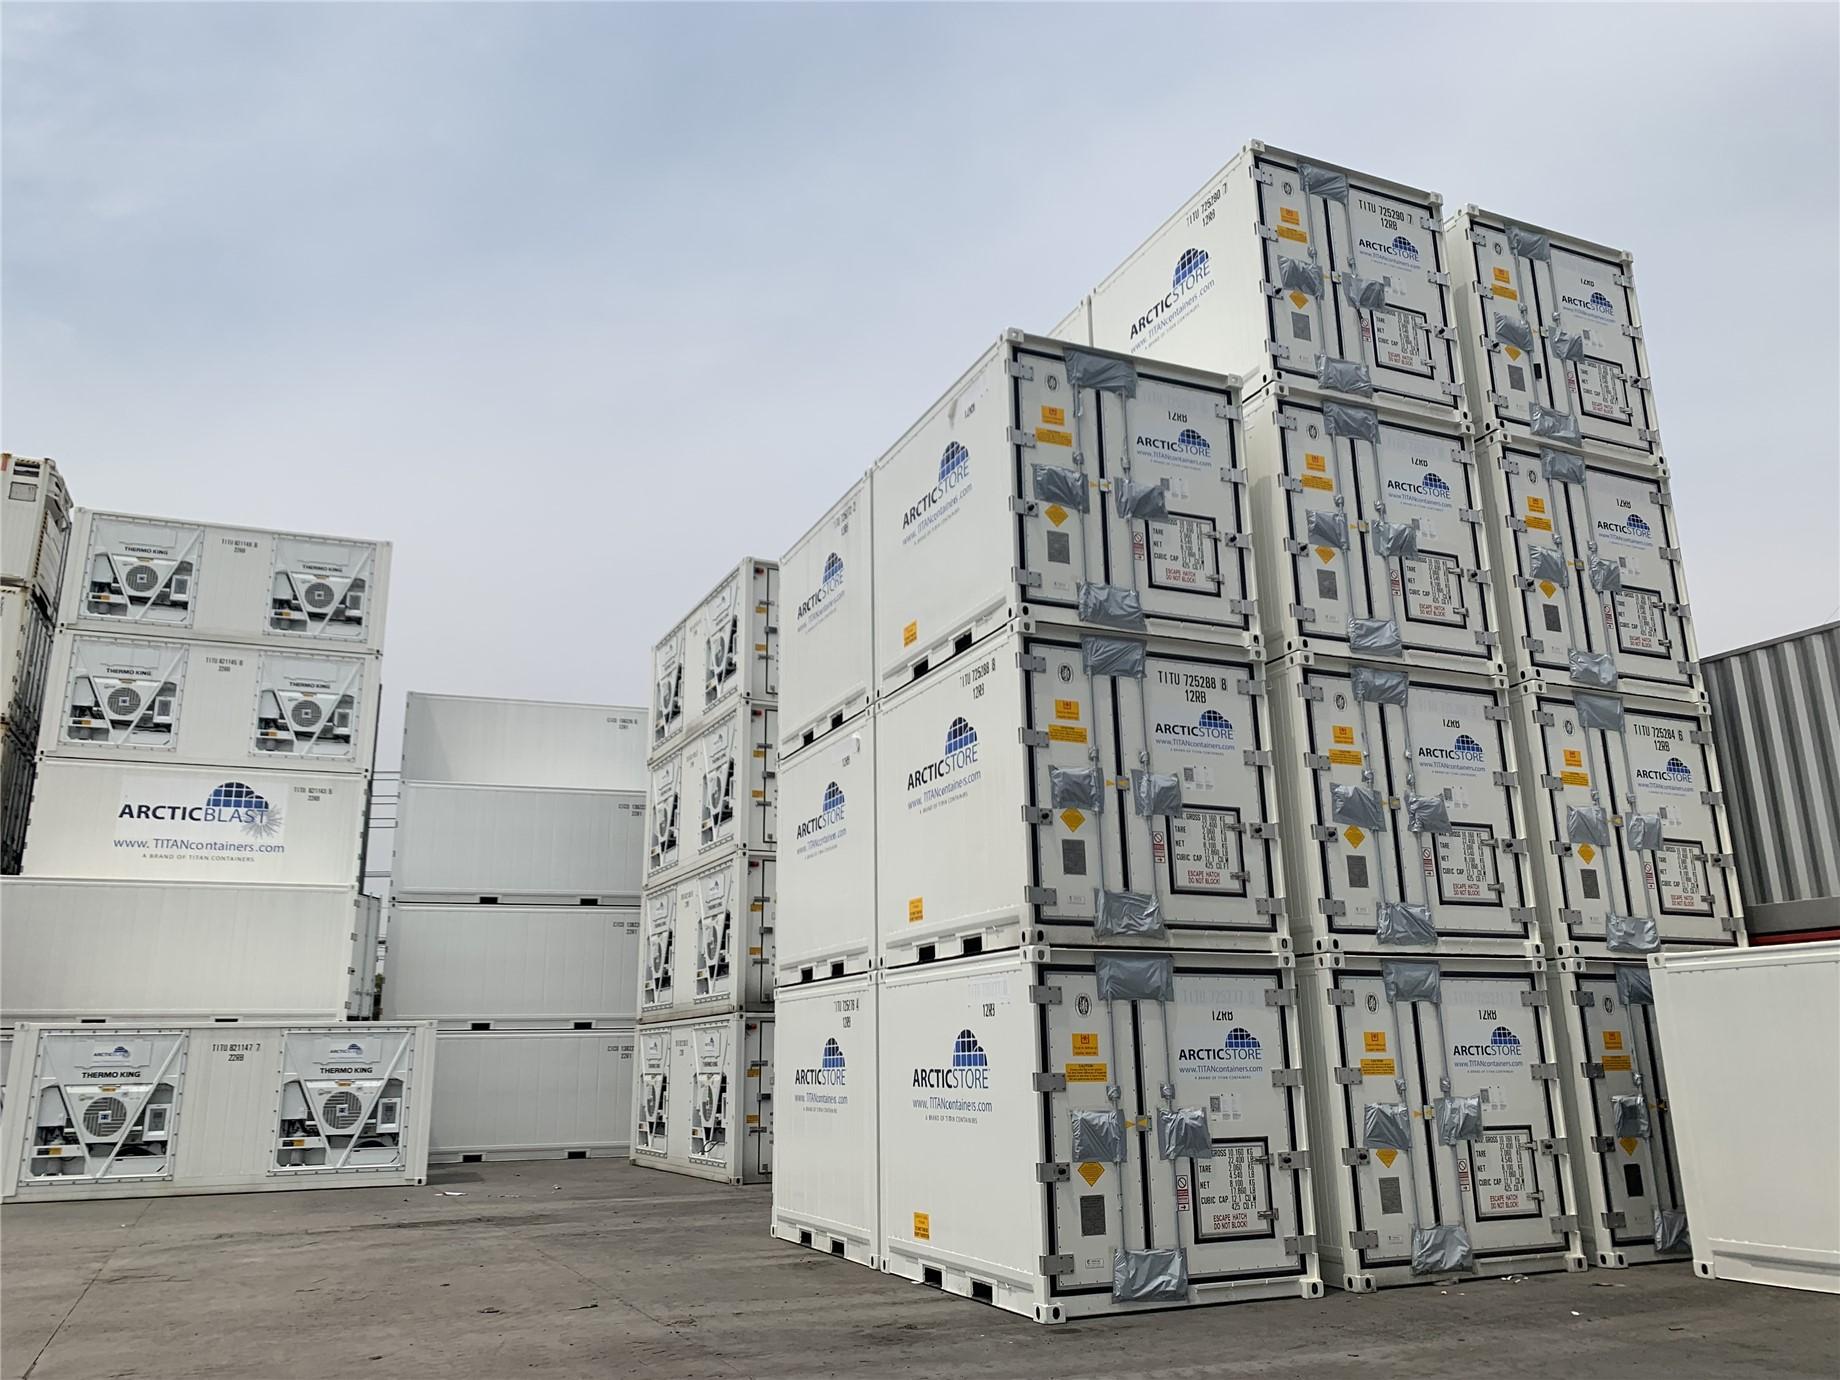 Door gear is protected for shipment